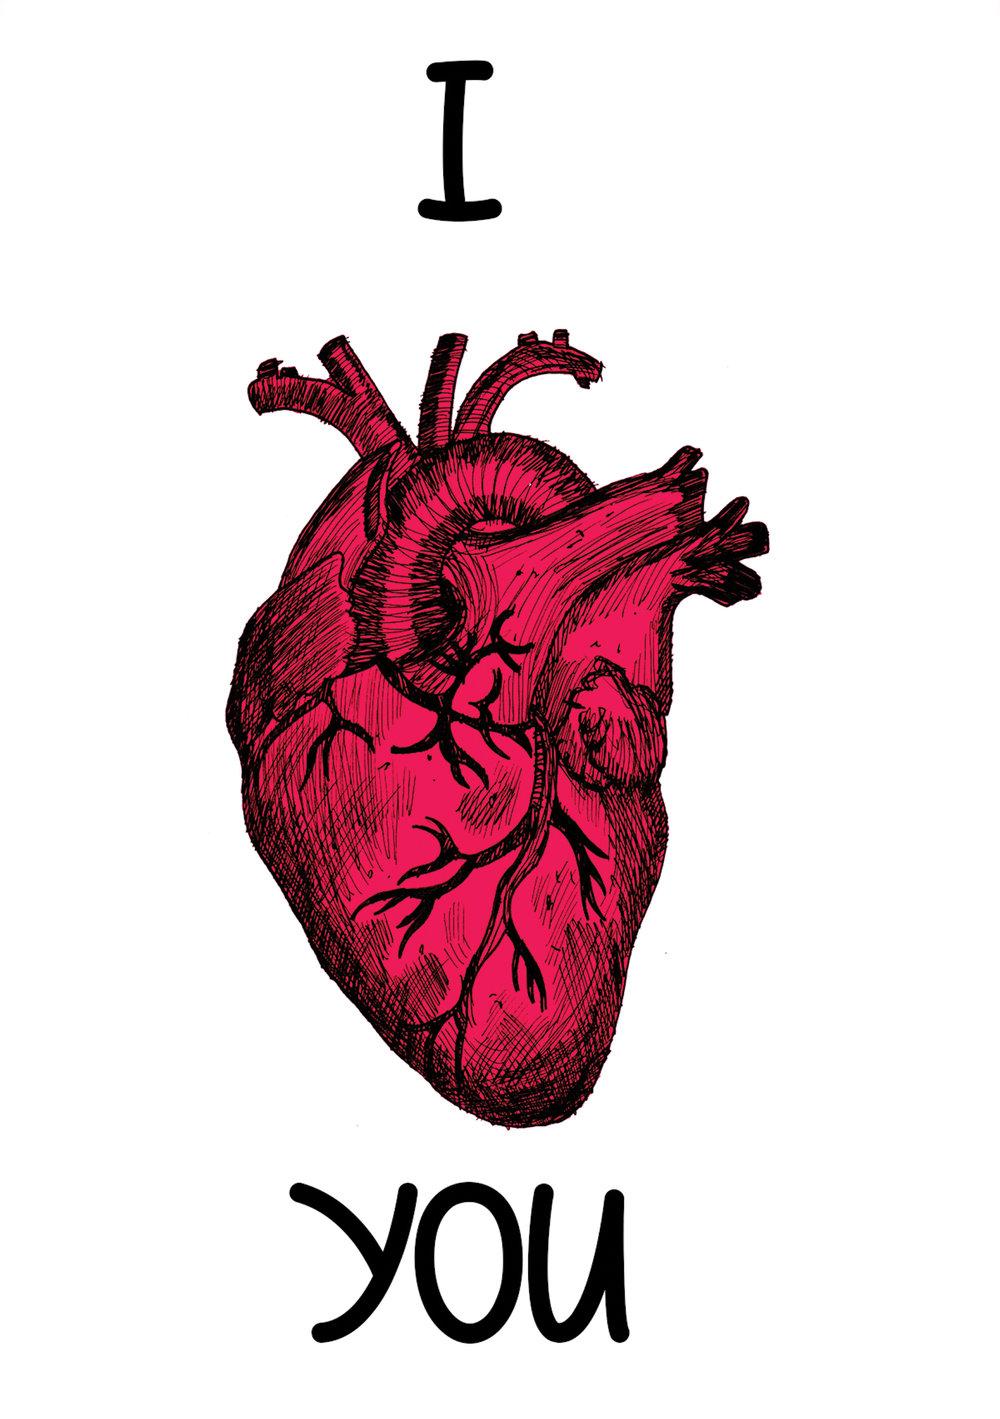 I Heart You-Rory kennedy- multi media art show.jpg